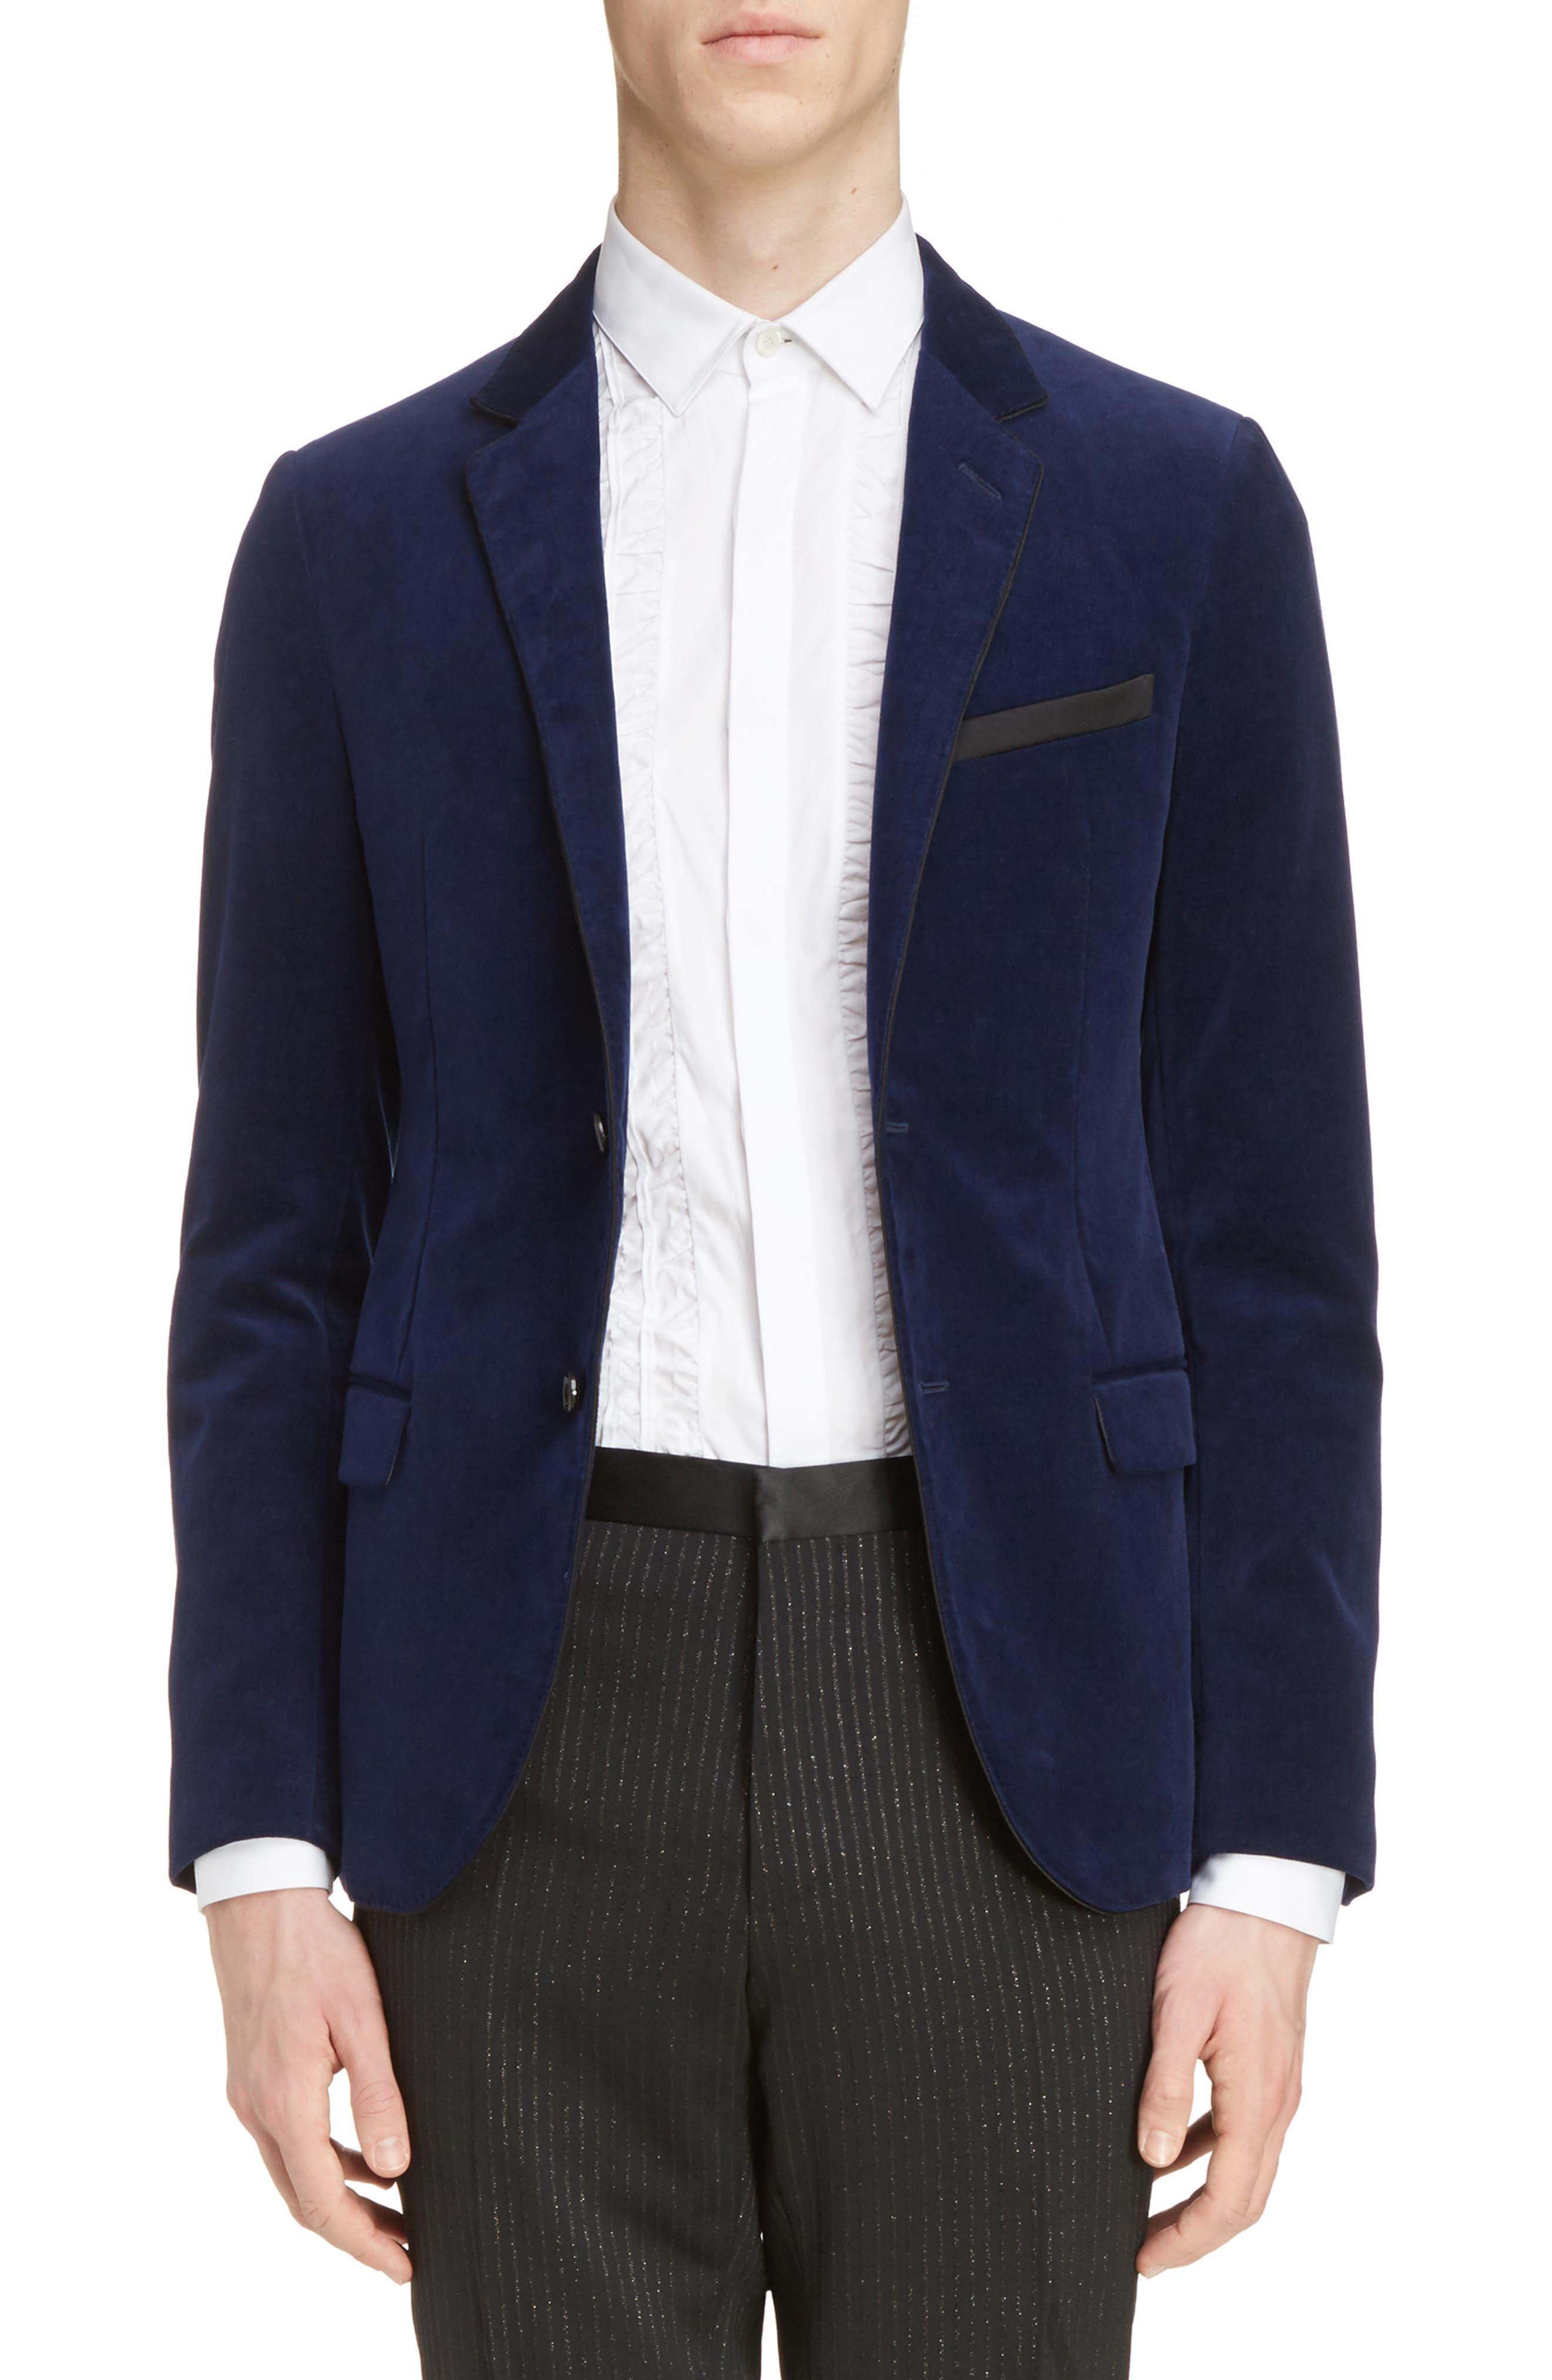 Alternate Image 1 Selected - Lanvin Extra Slim Fit Velvet Jacket